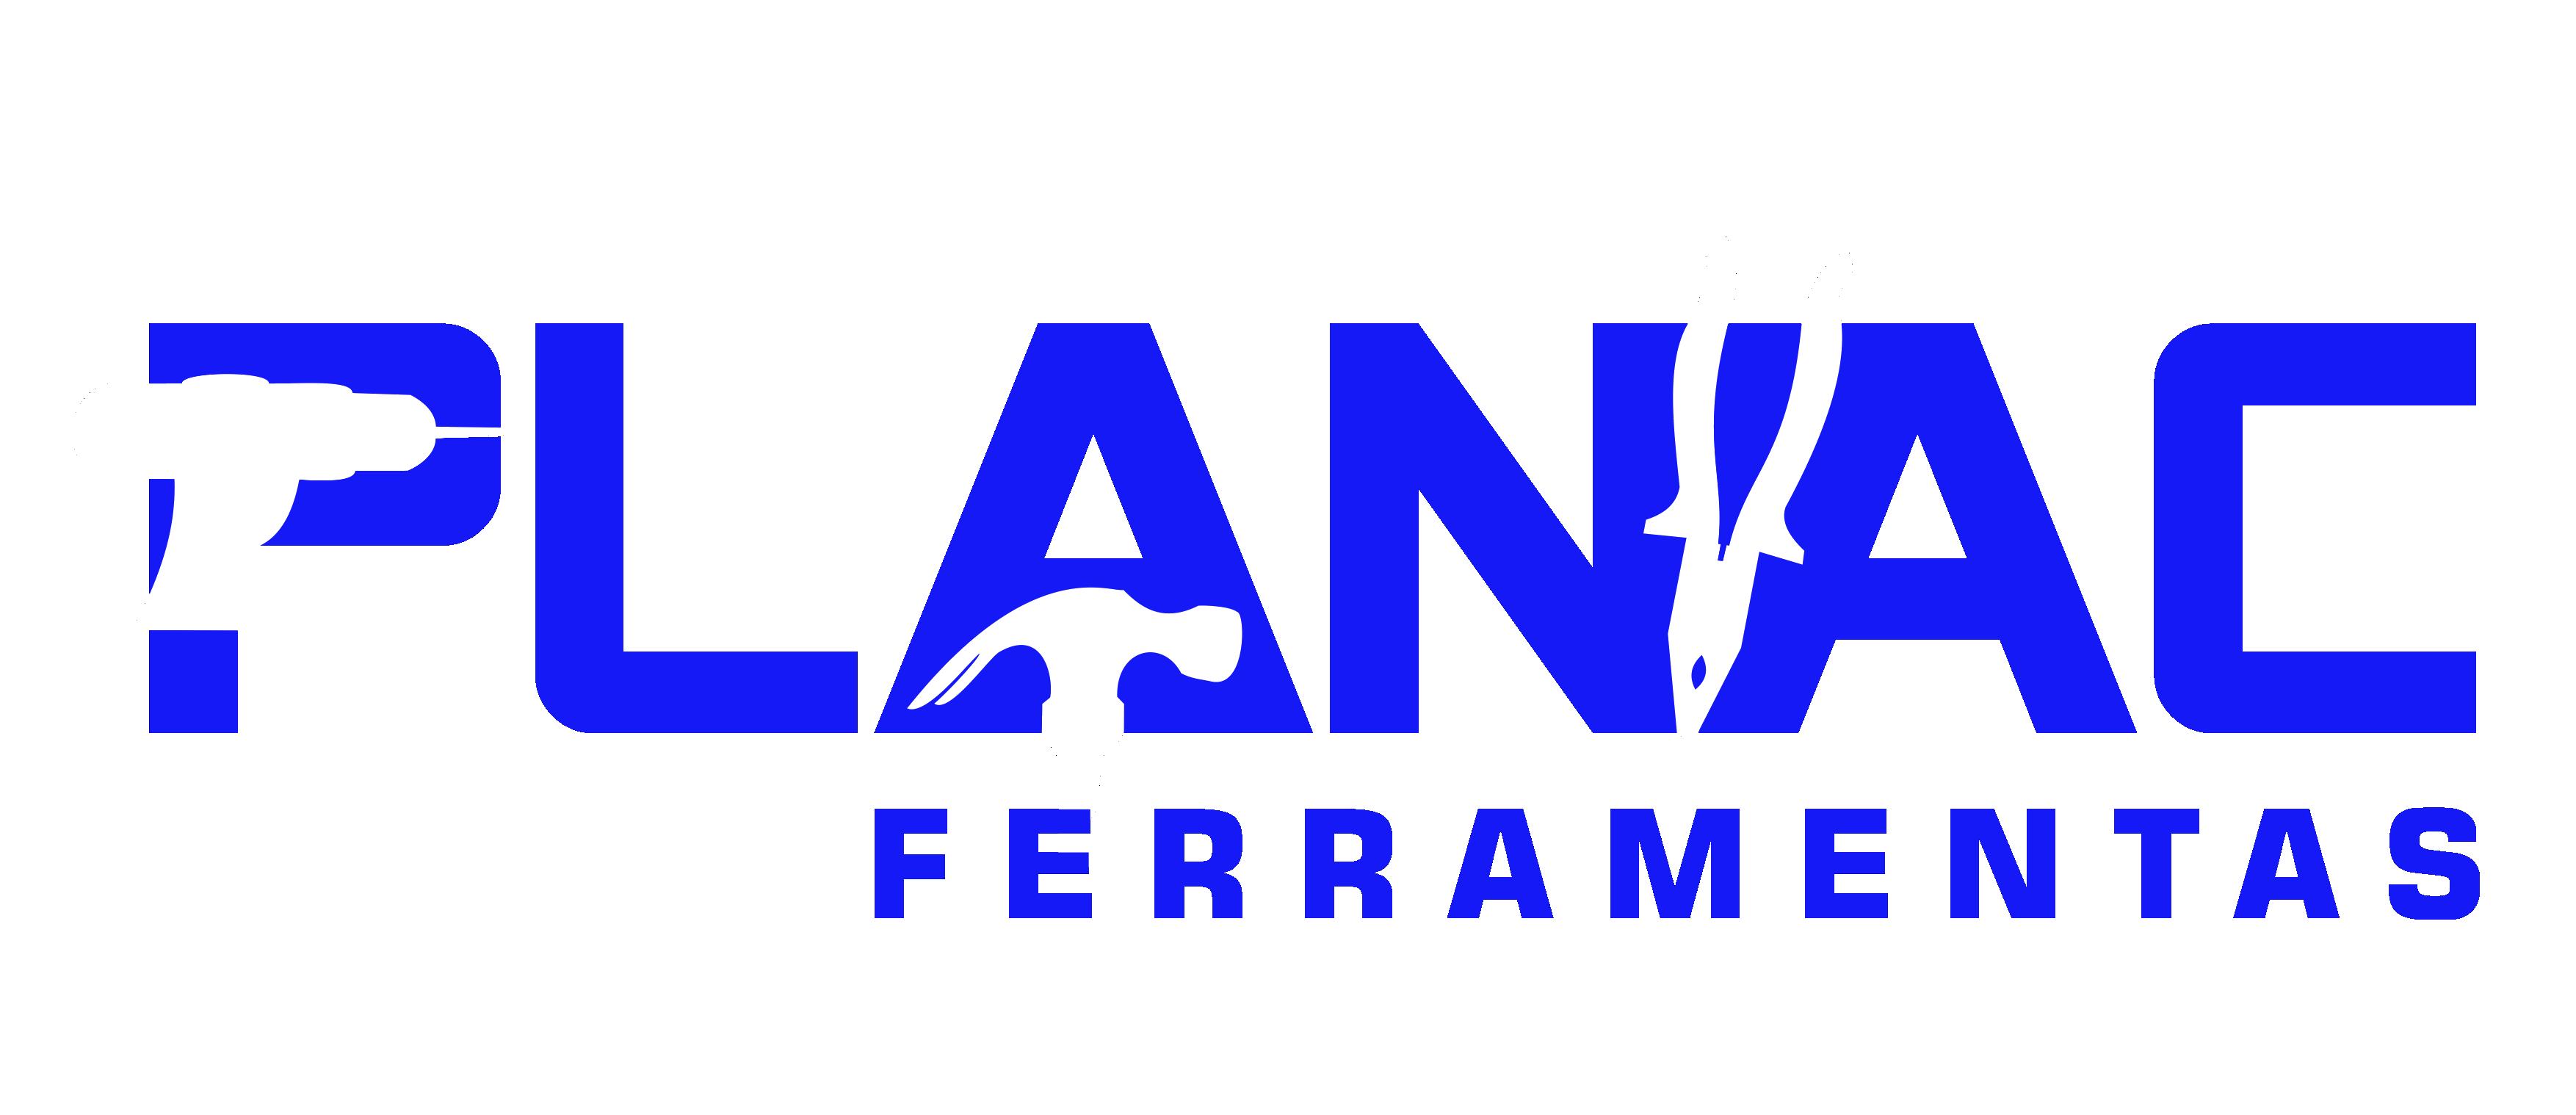 Planac